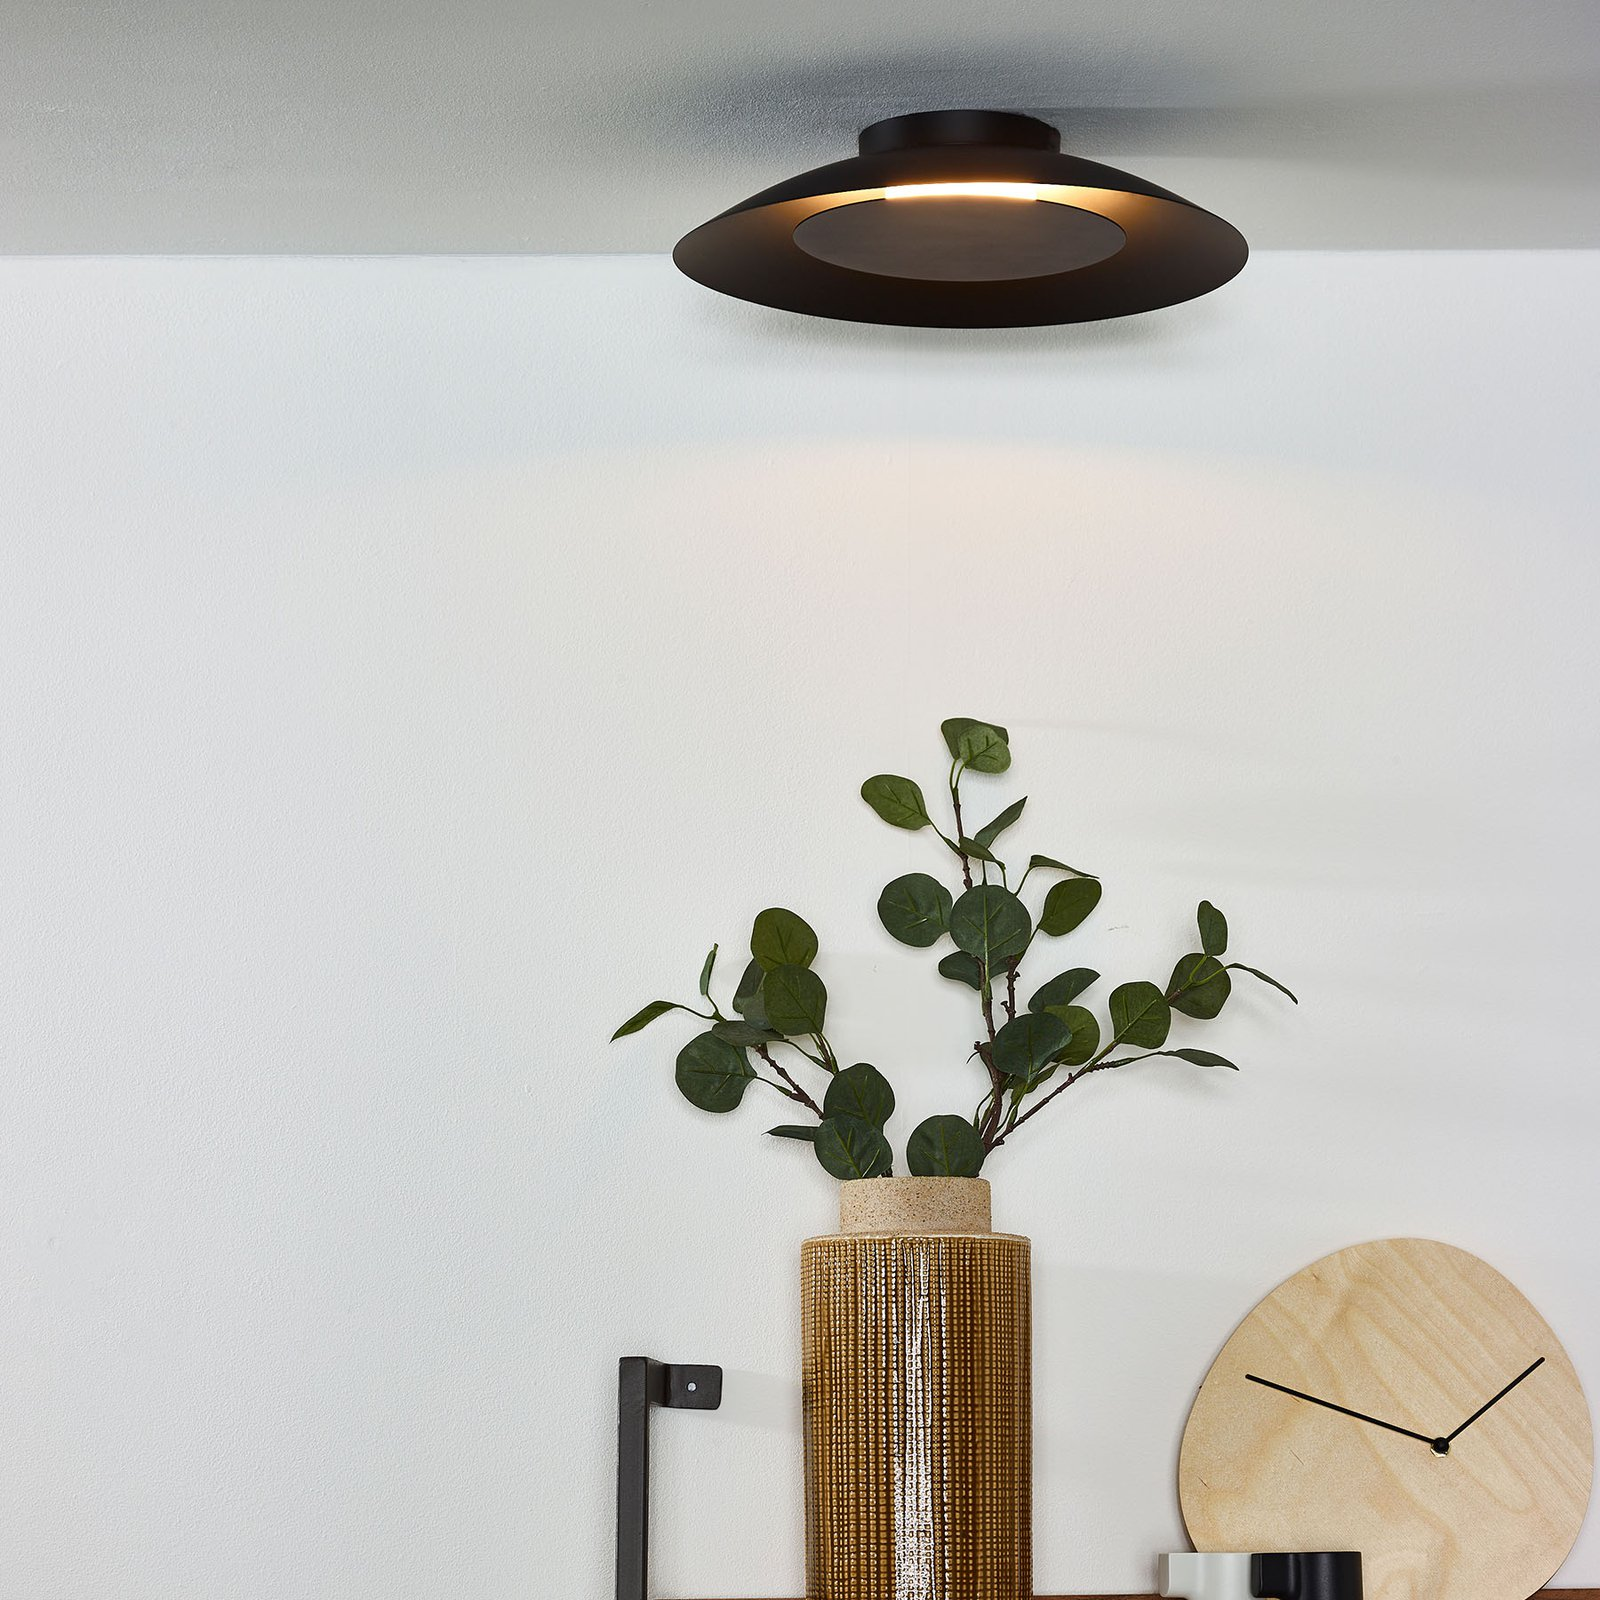 Foskal LED-taklampe i svart, Ø 34,5 cm